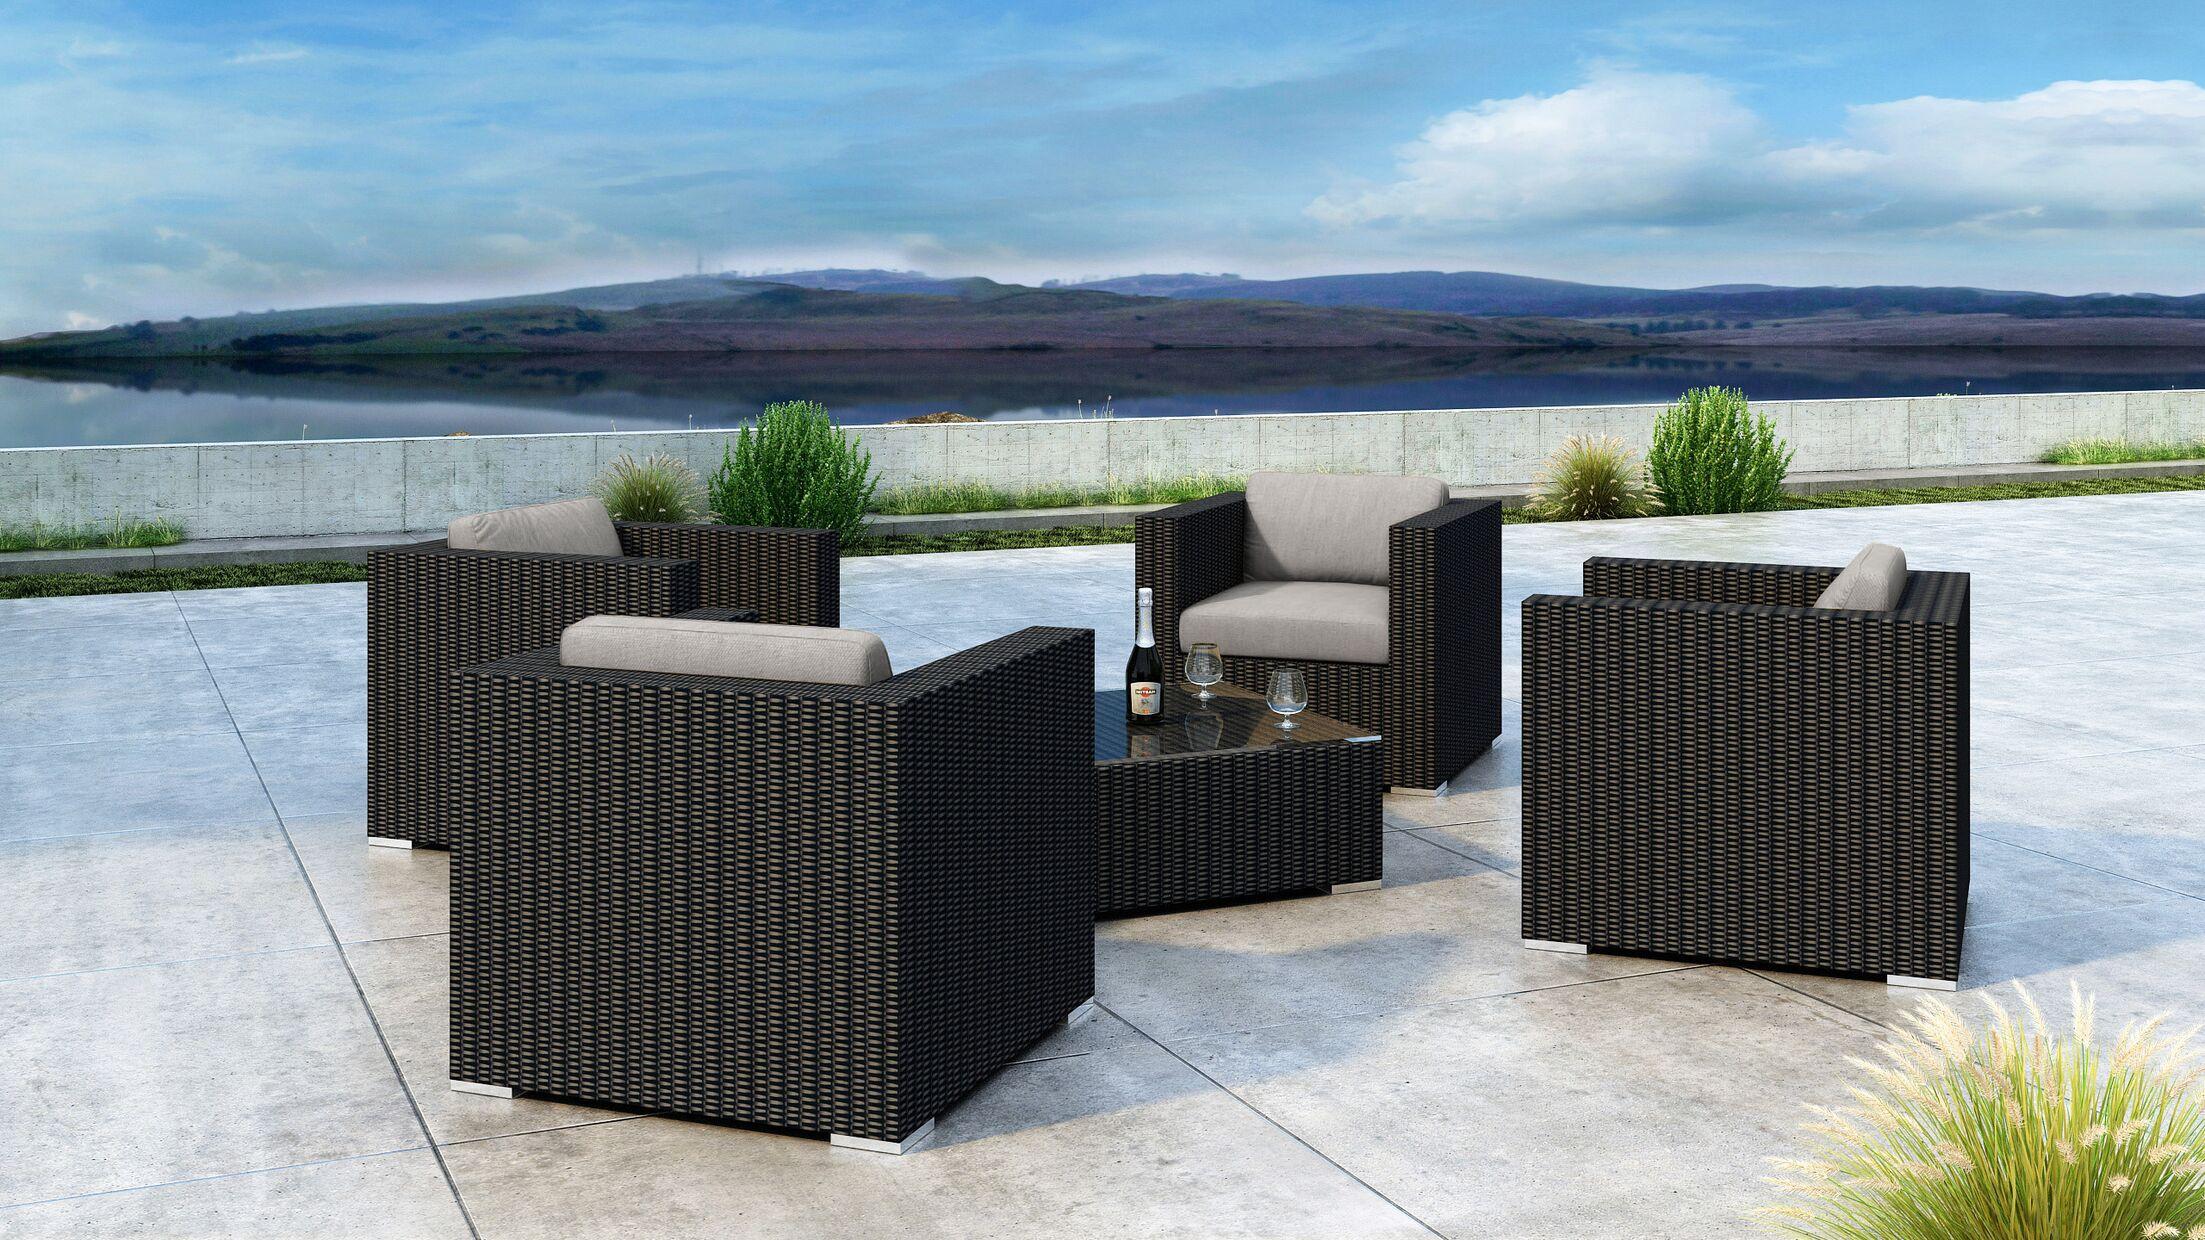 Glendale 5 Piece Sofa Set with Sunbrella Cushion Cushion Color: Cast Silver